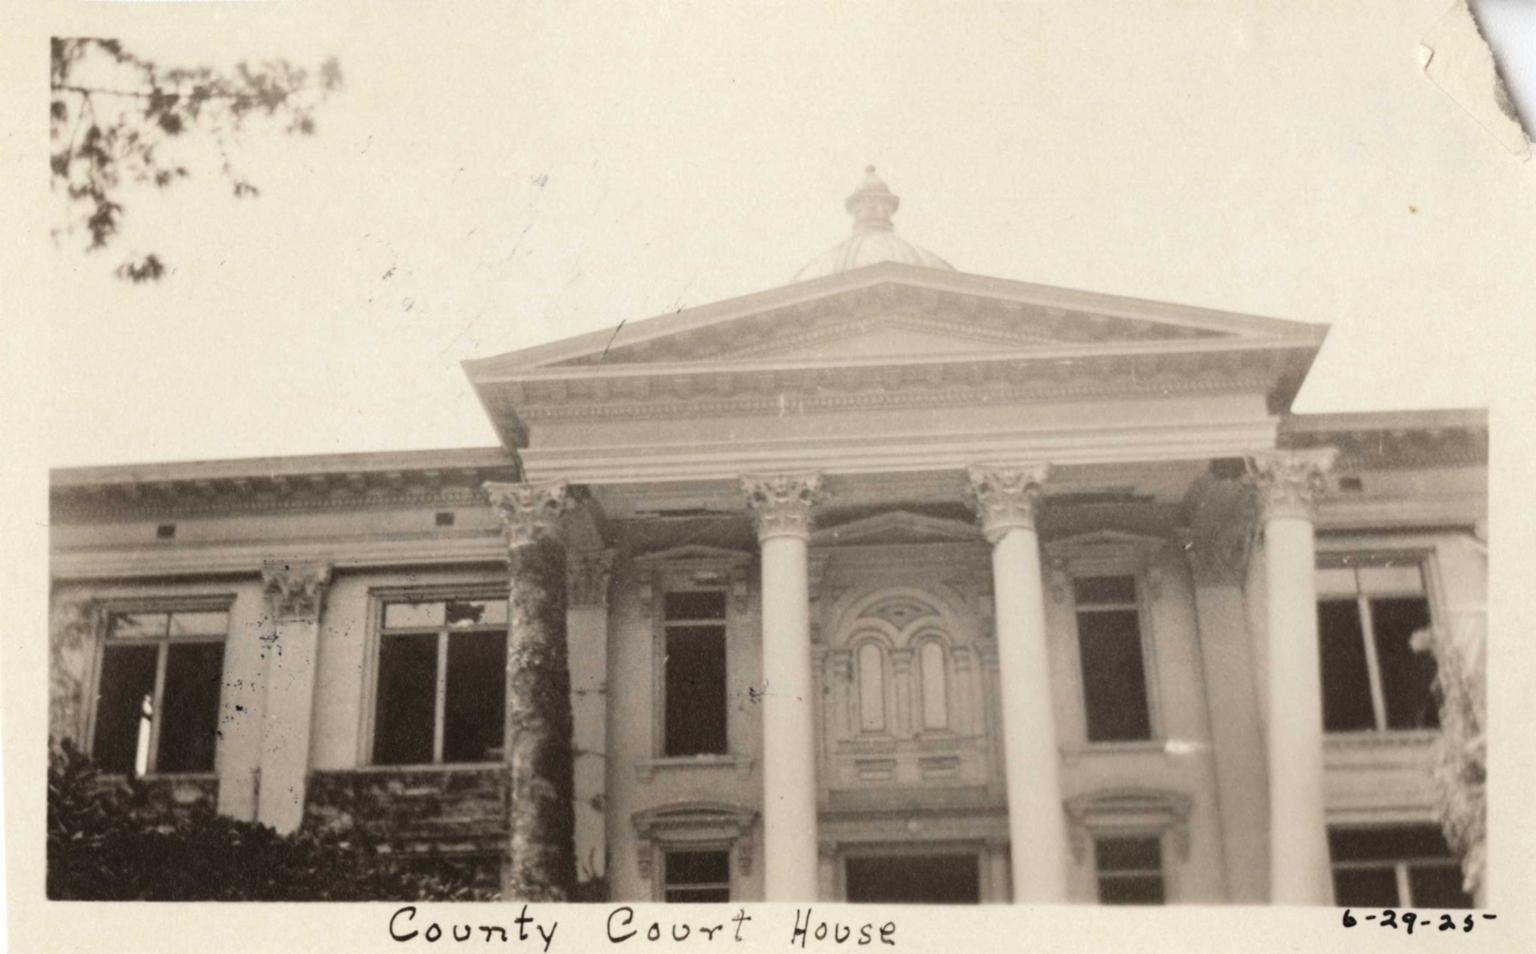 Santa Barbara 1925 Earthquake damage - County Courthouse